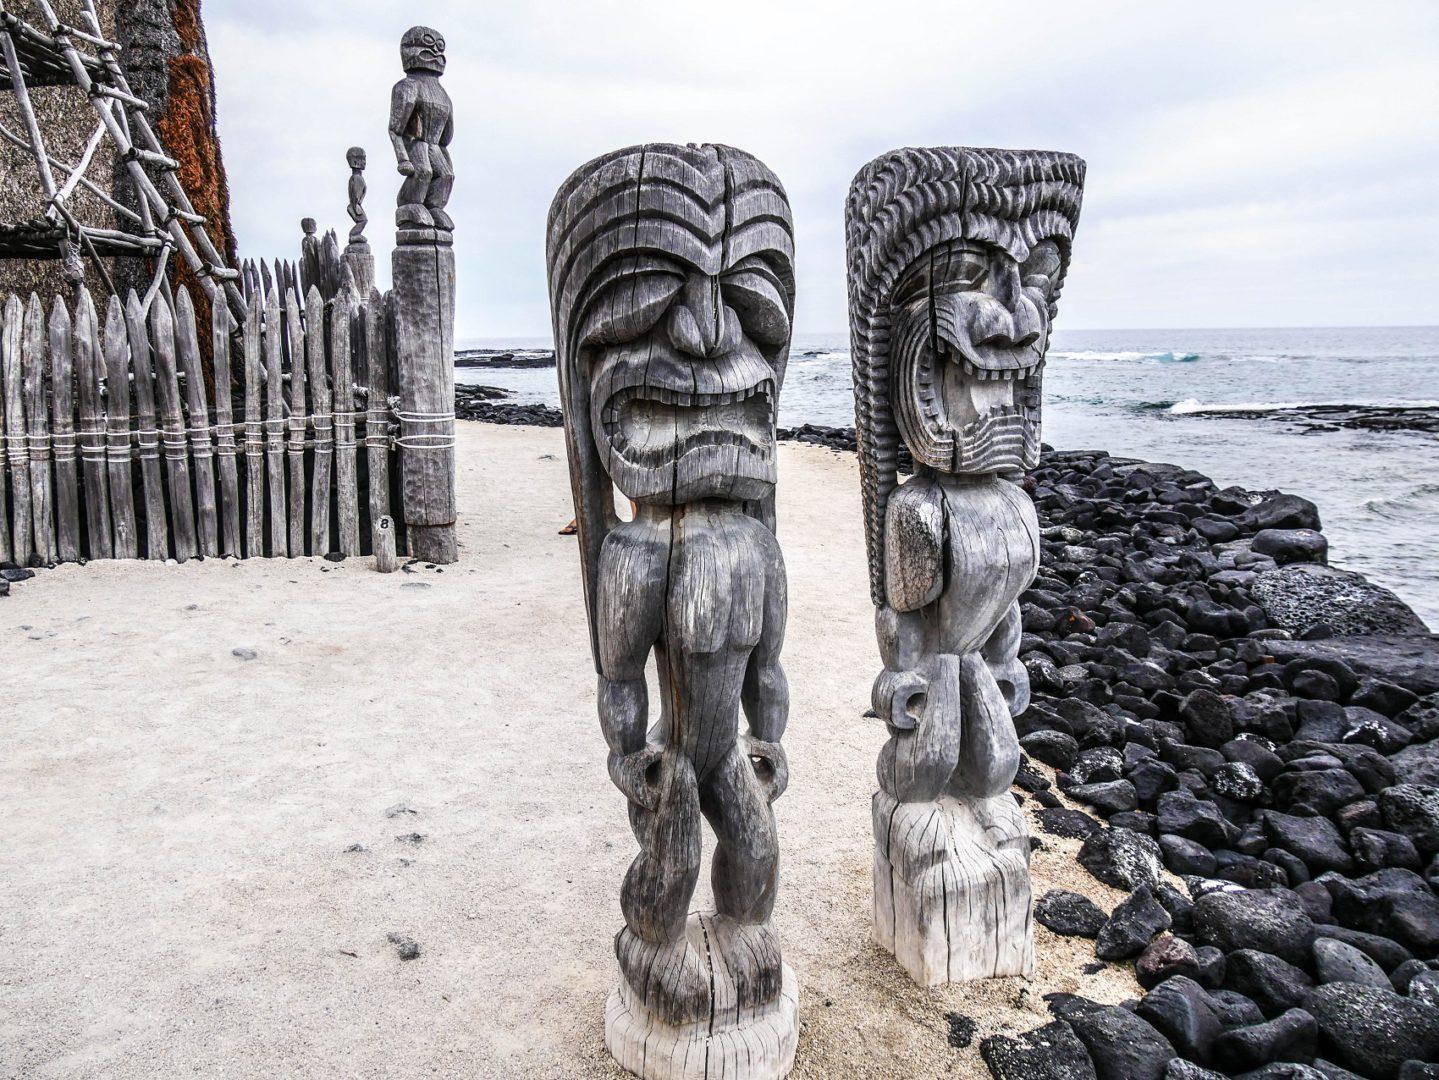 parc historique national de Pu'uhonna o Honaunau Hawaii destination historique